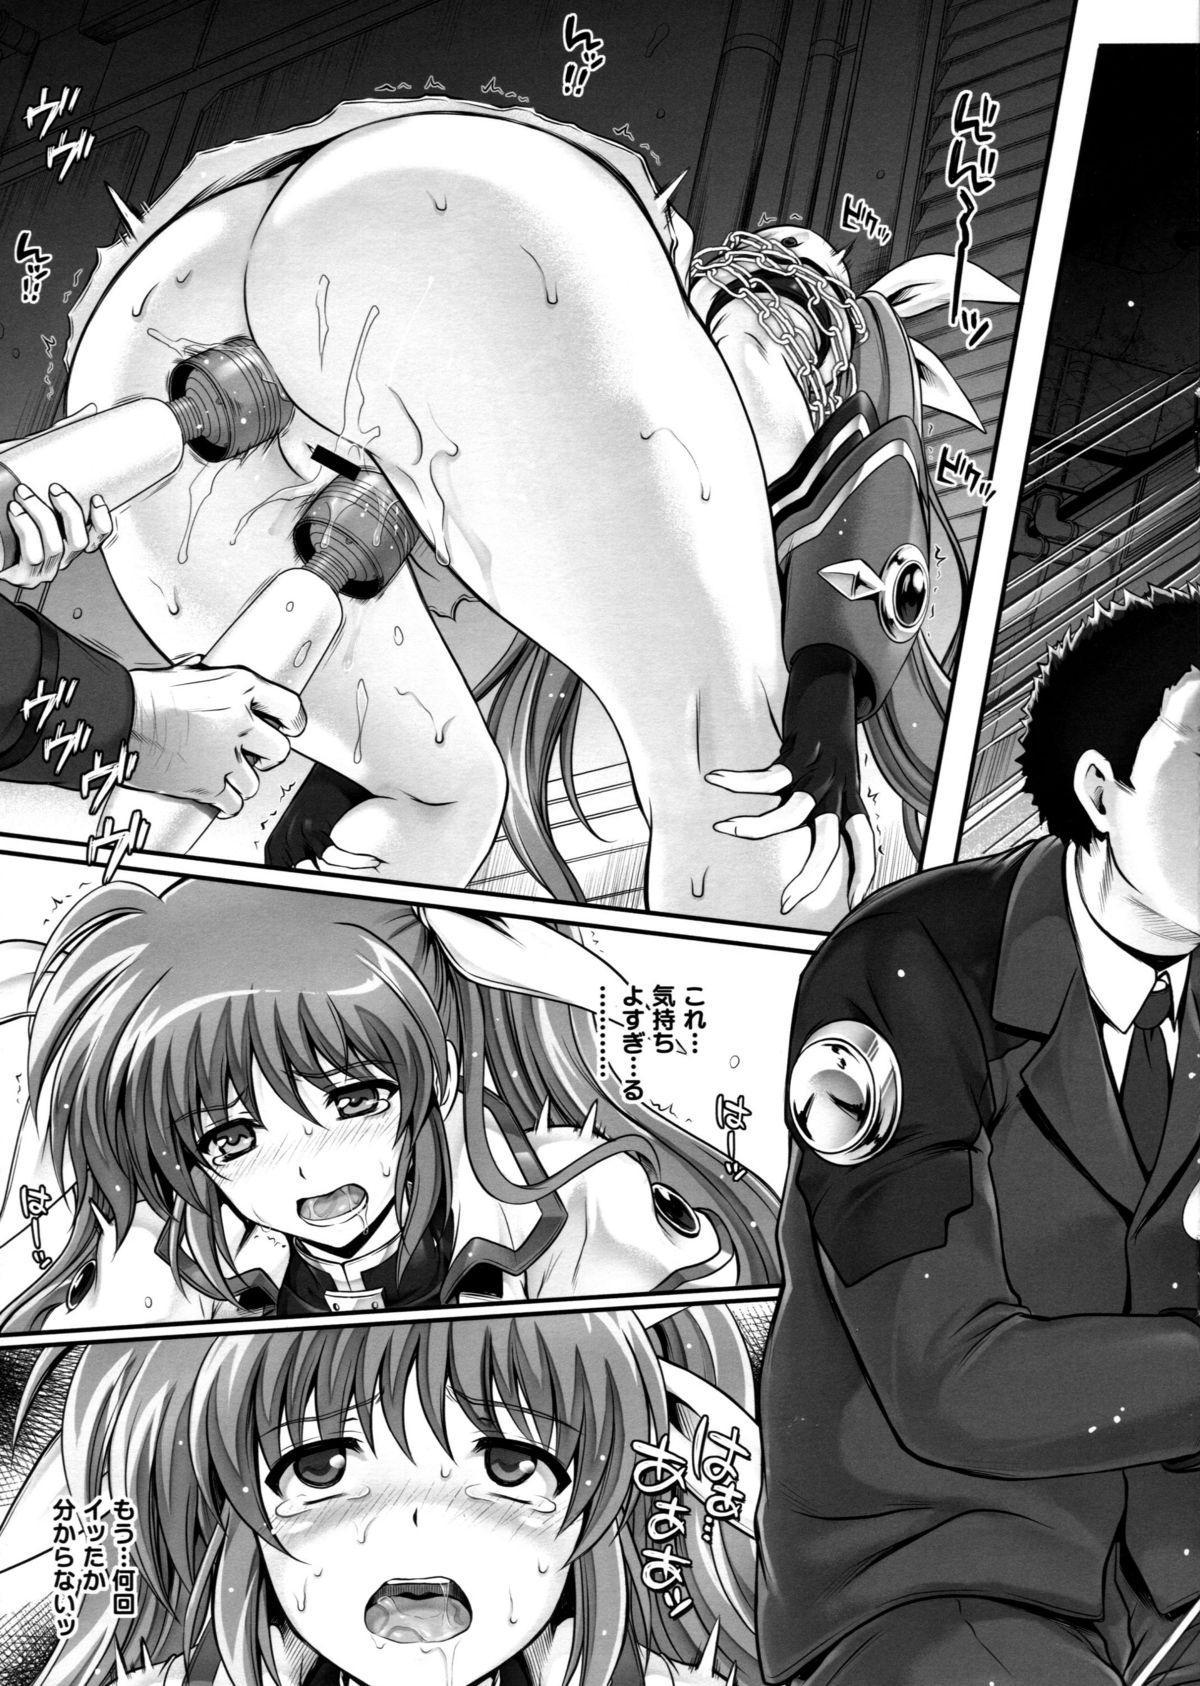 Gokuusu Kahitsuban Takamatic After 6